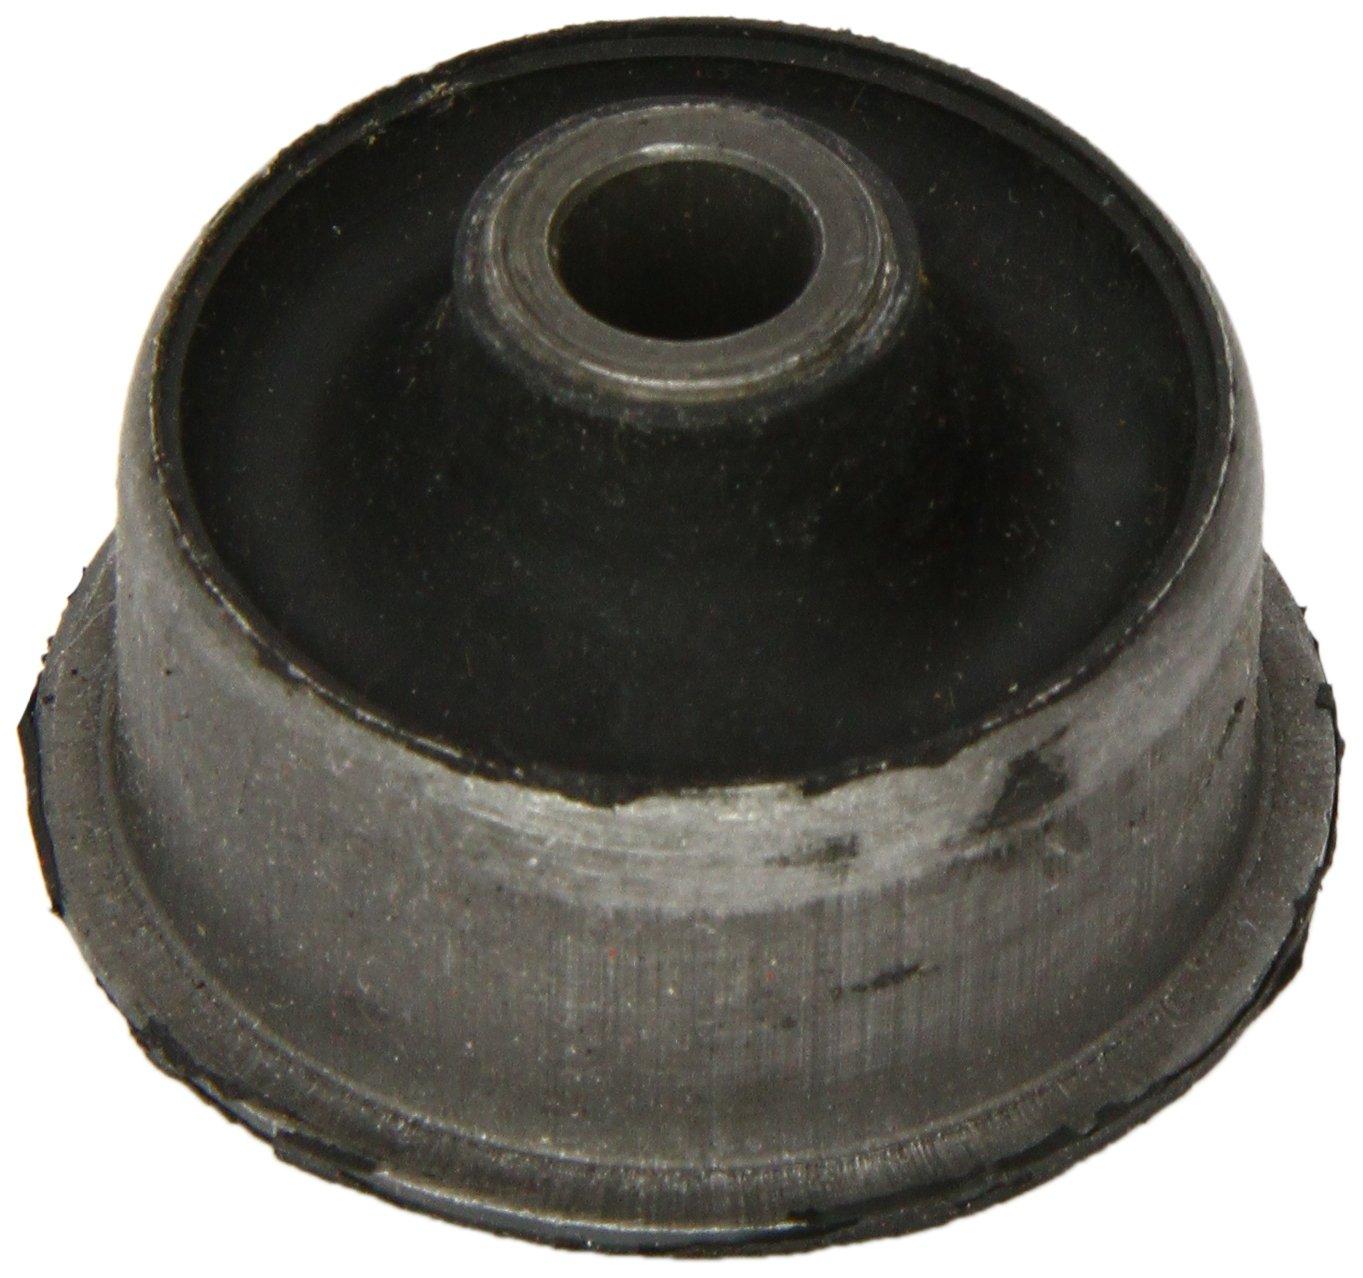 MOOG Control Arm Bush for FORD KA FD-SB-1344 Discount Car Parts